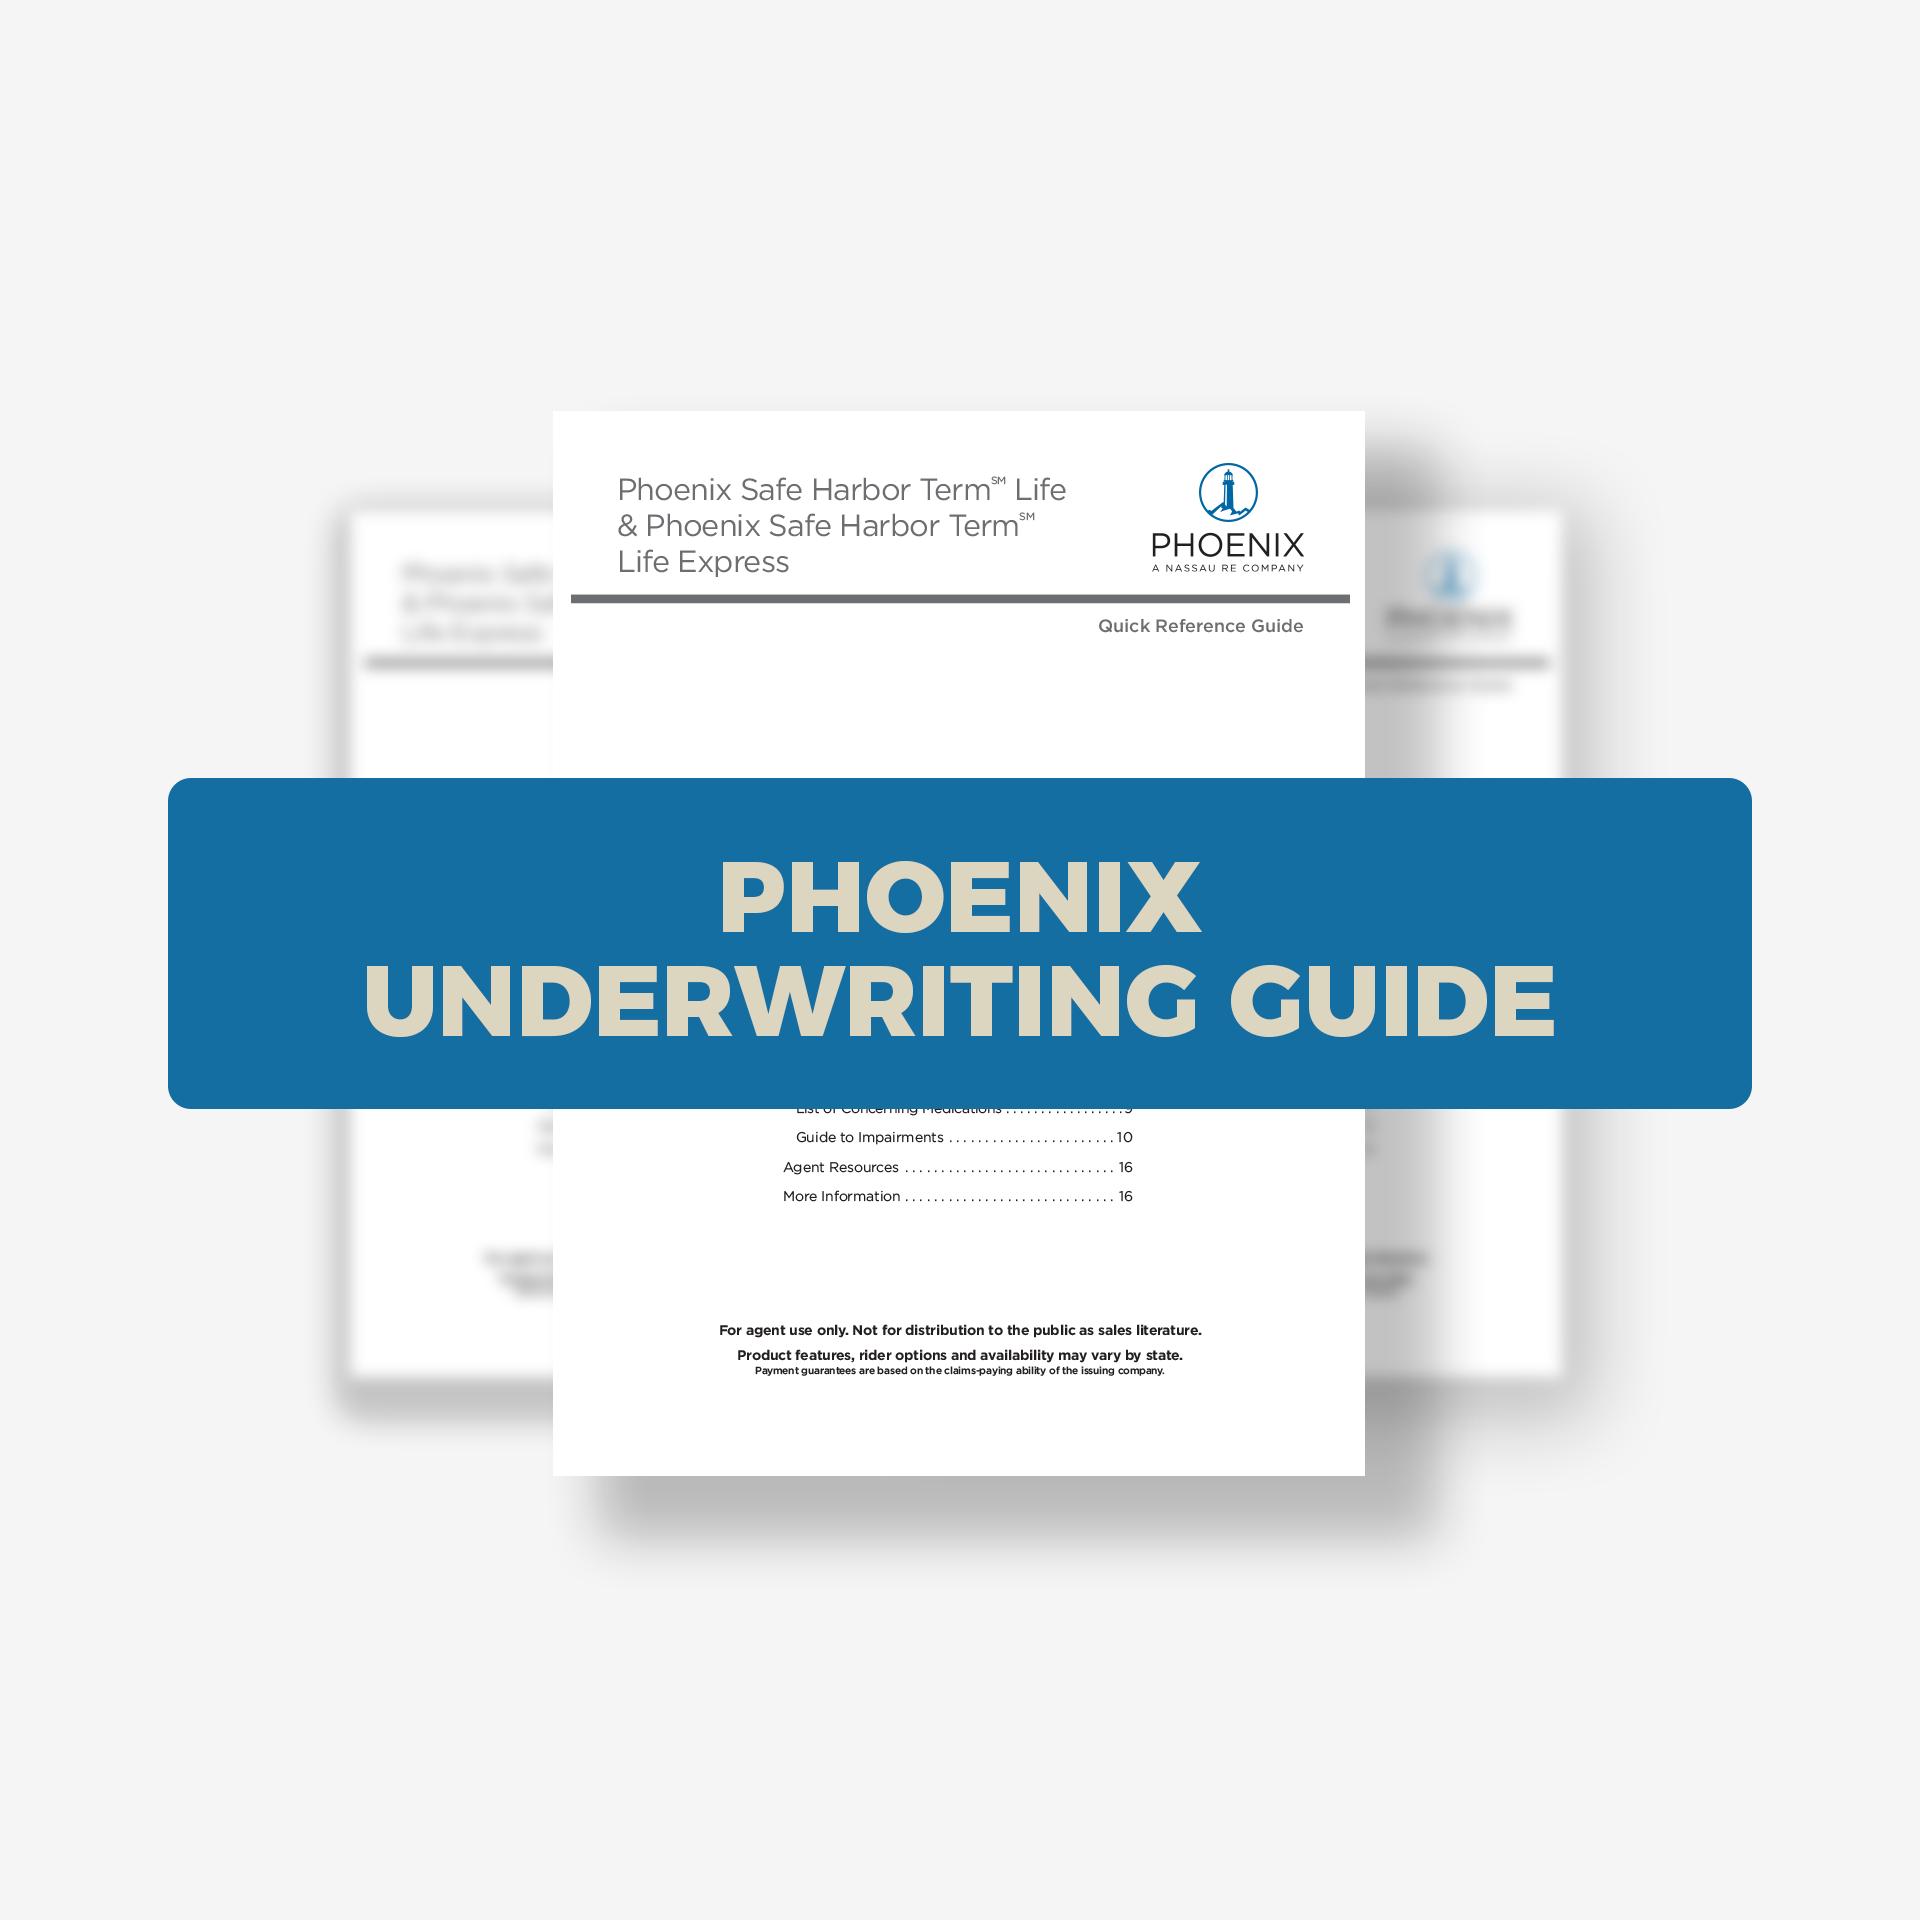 Phoenix Underwriting Guide.png